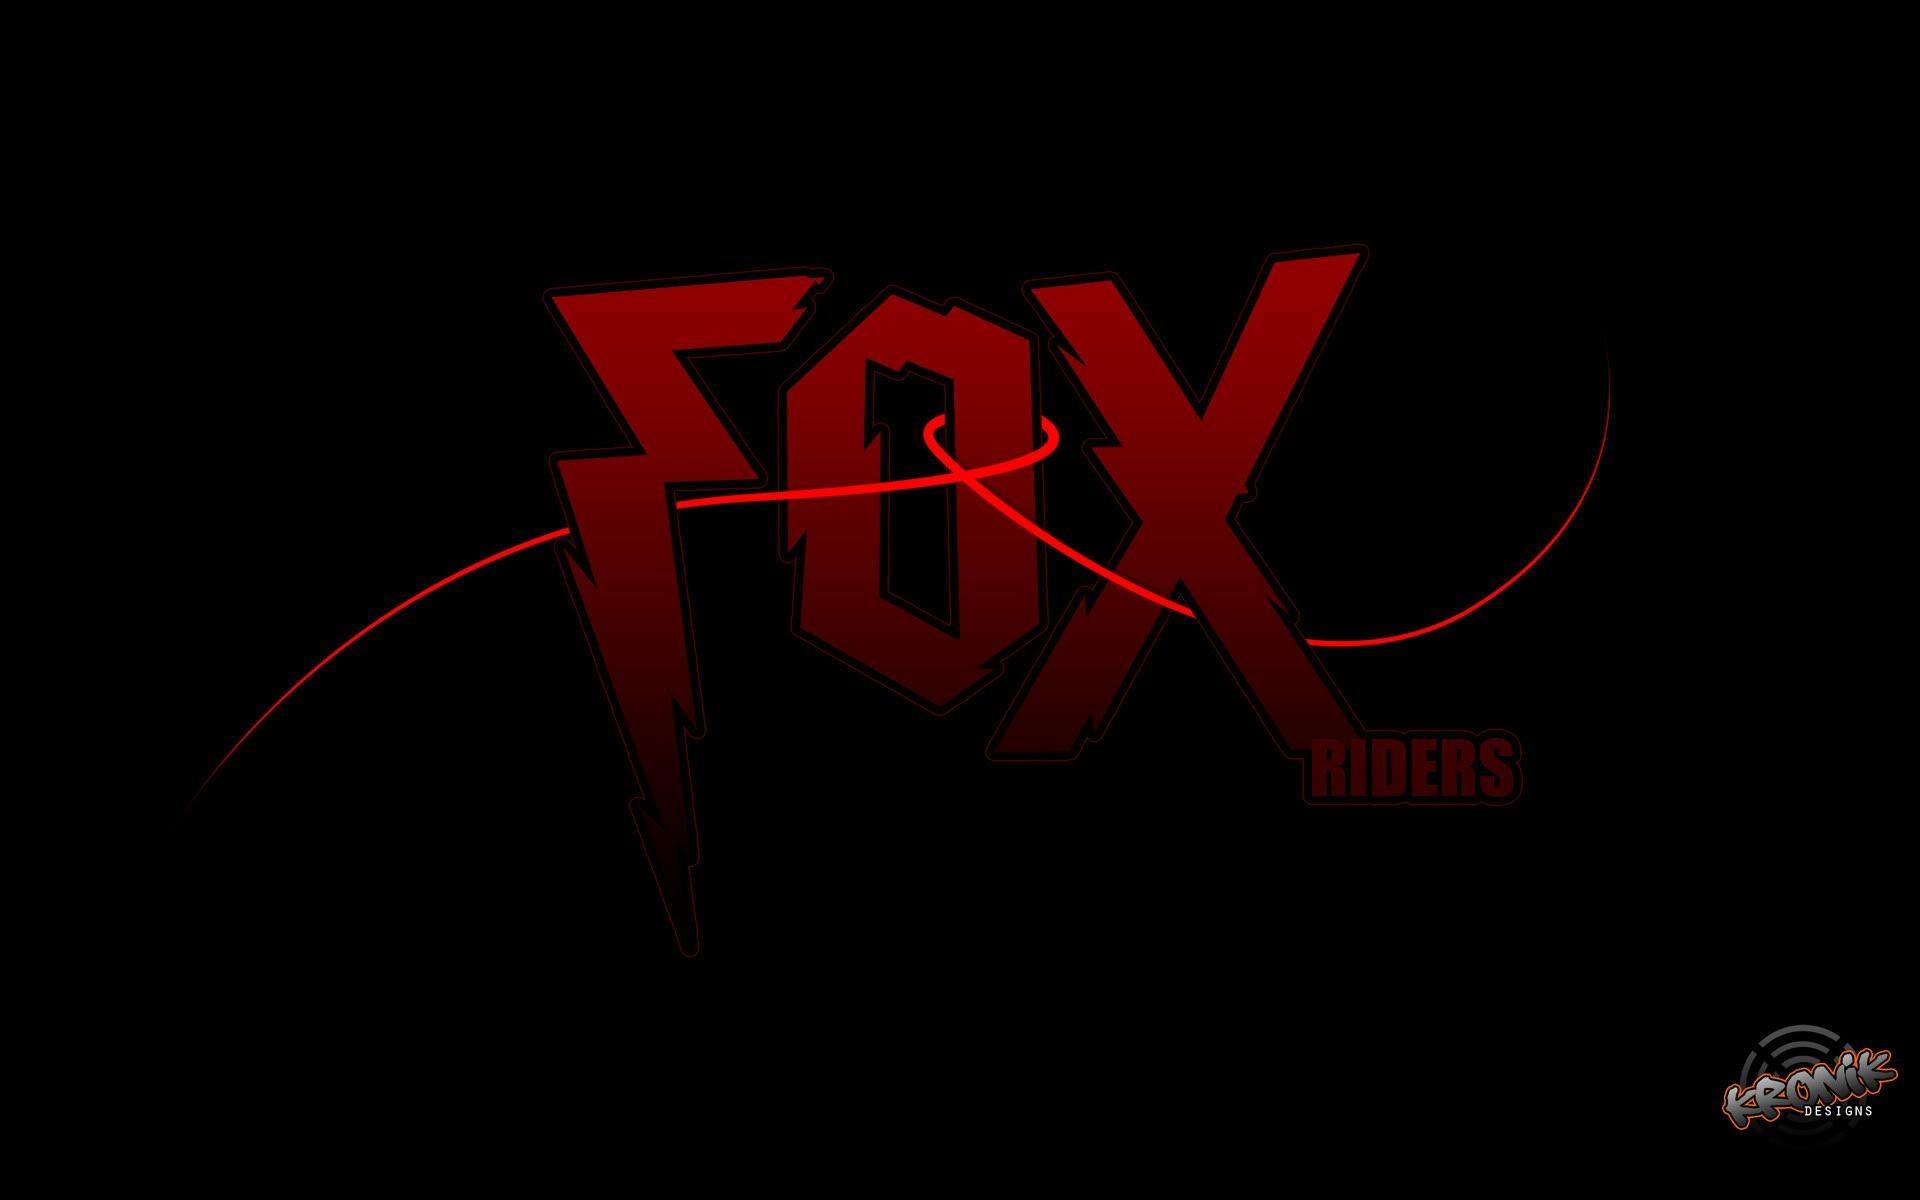 Fox Racing Wallpaper Hd 74 Images